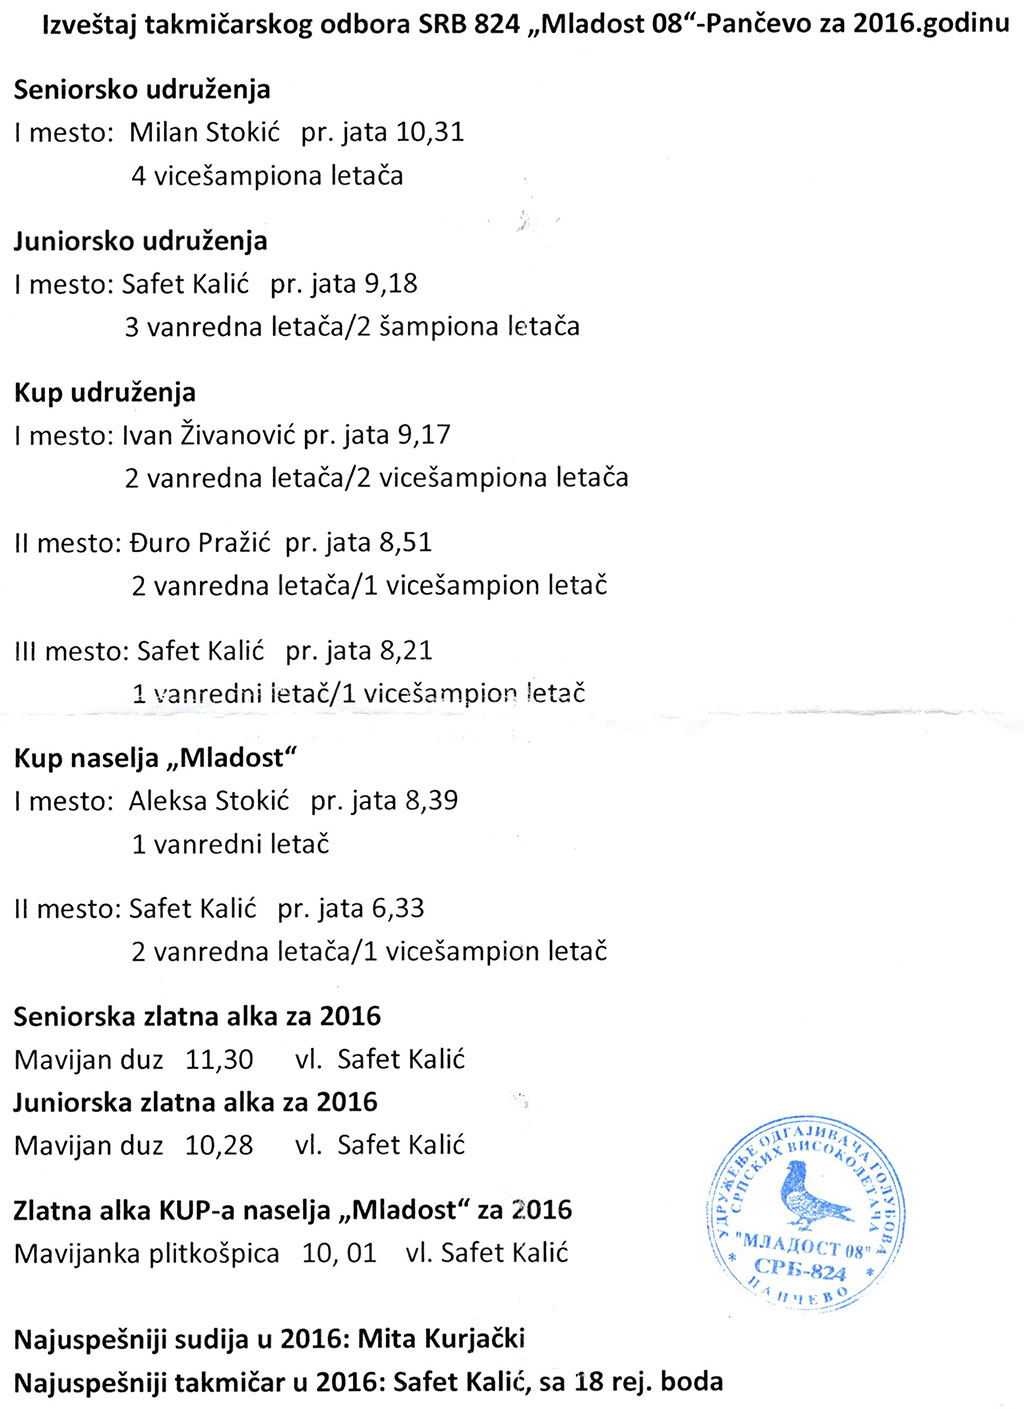 "Извештај такмичарског одбора ""Младост 08"" - Панево за 2016. годину"